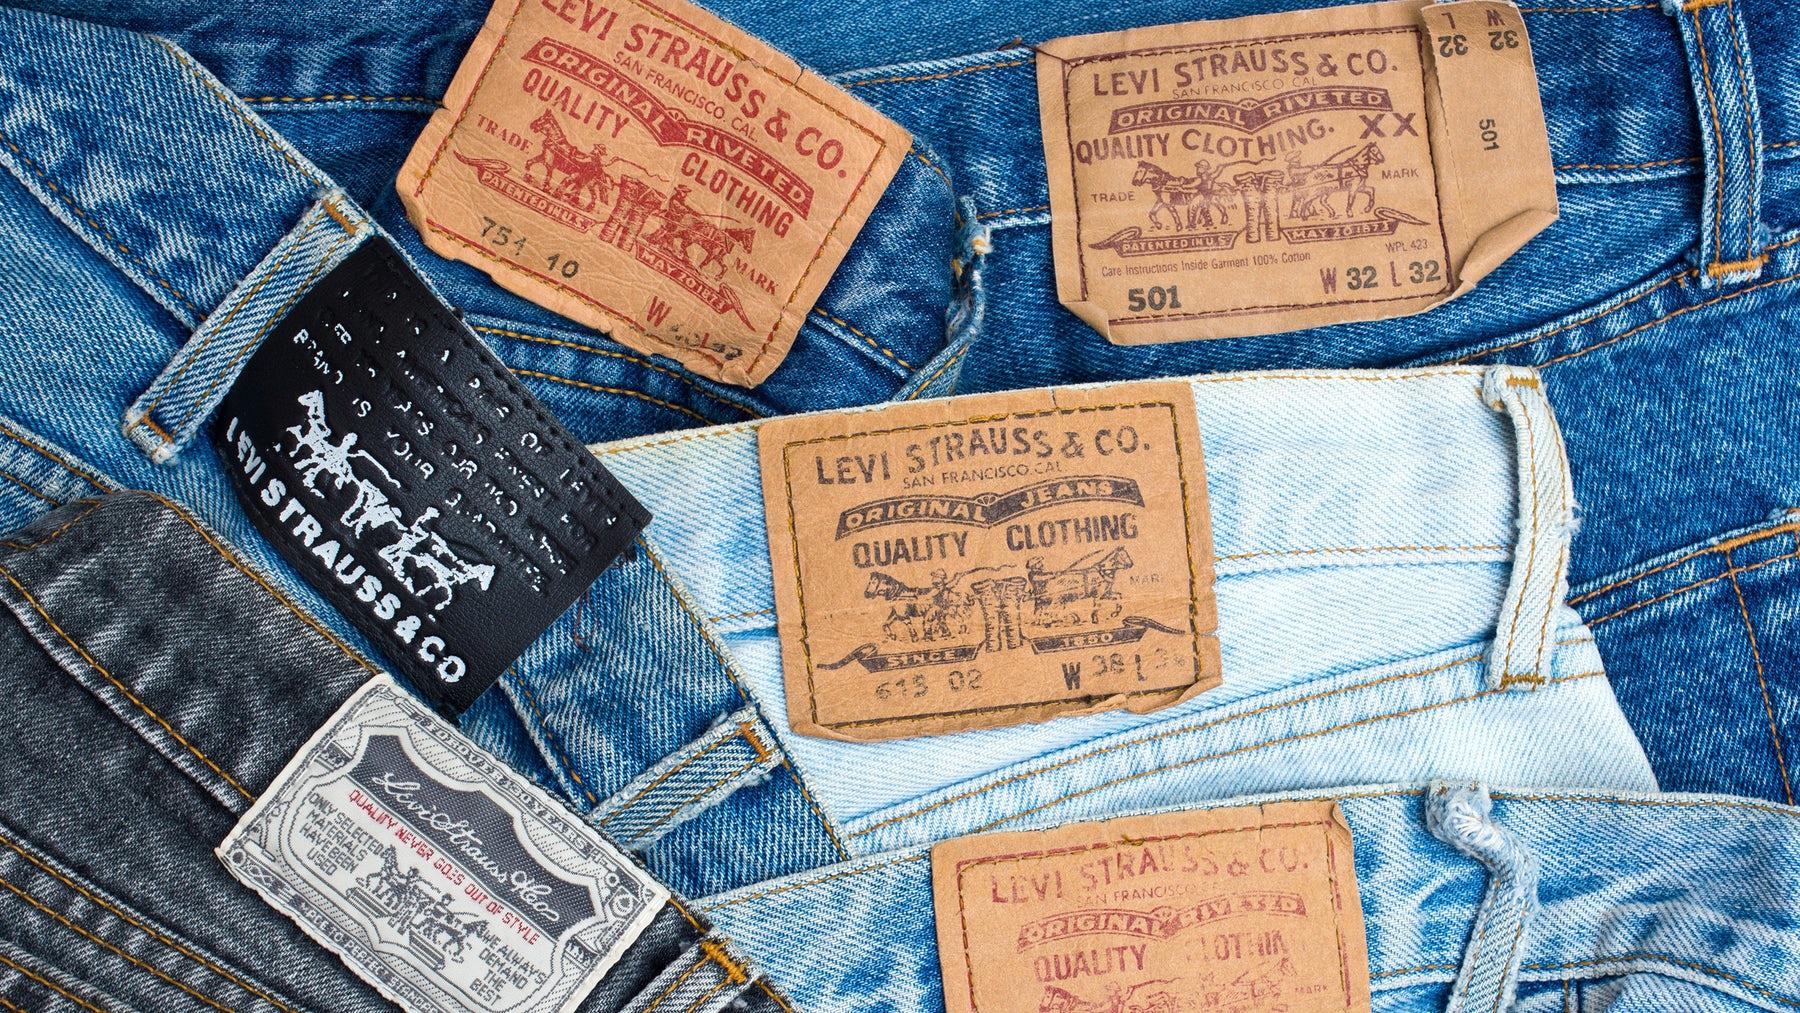 Levi's jeans   Source: Shutterstock